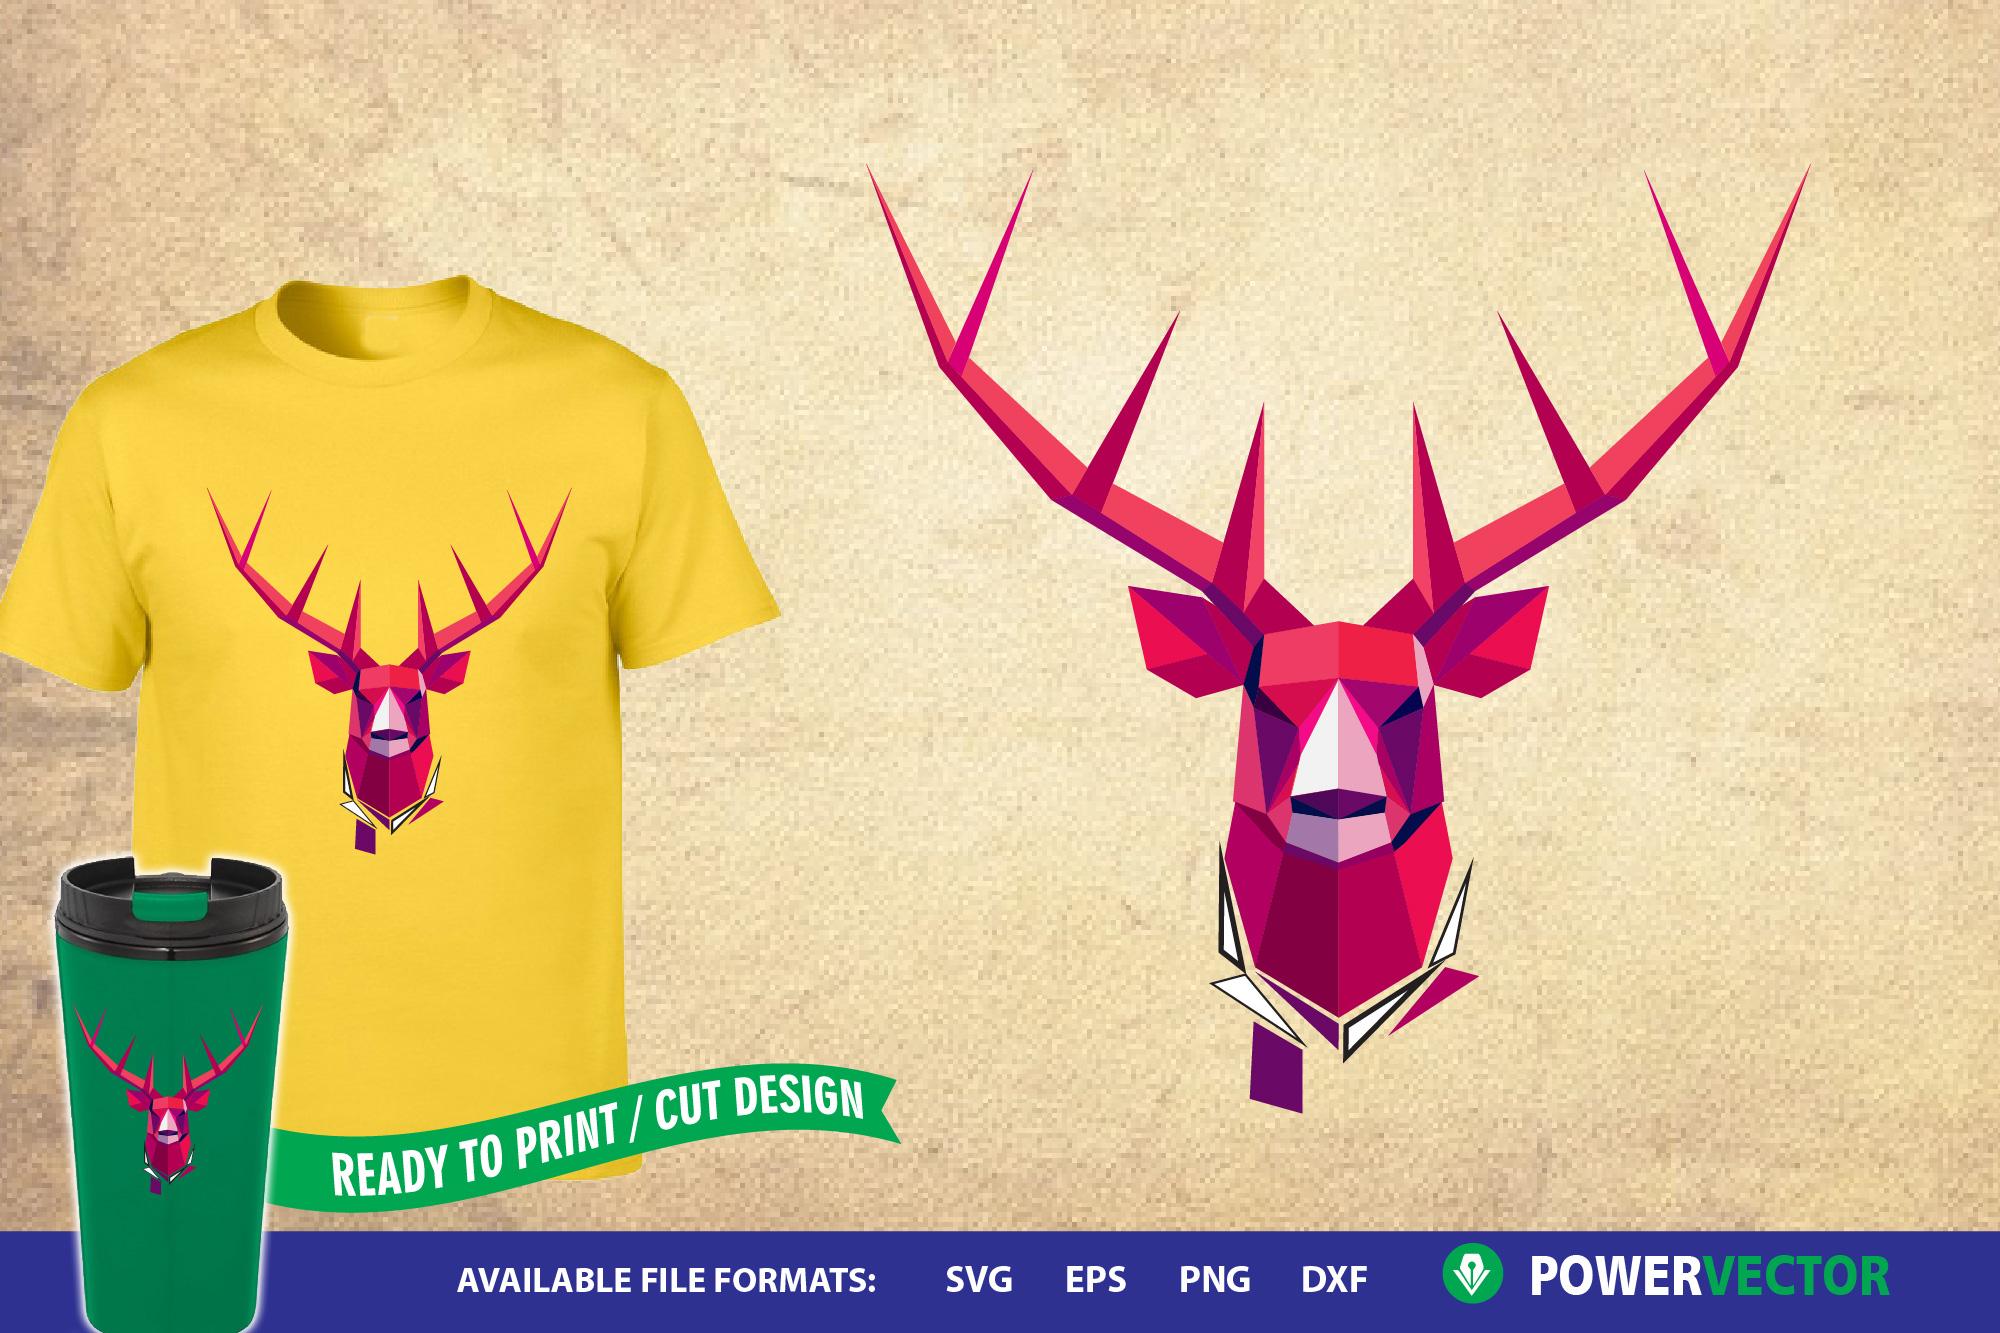 Deer Head Geometric Design example image 1